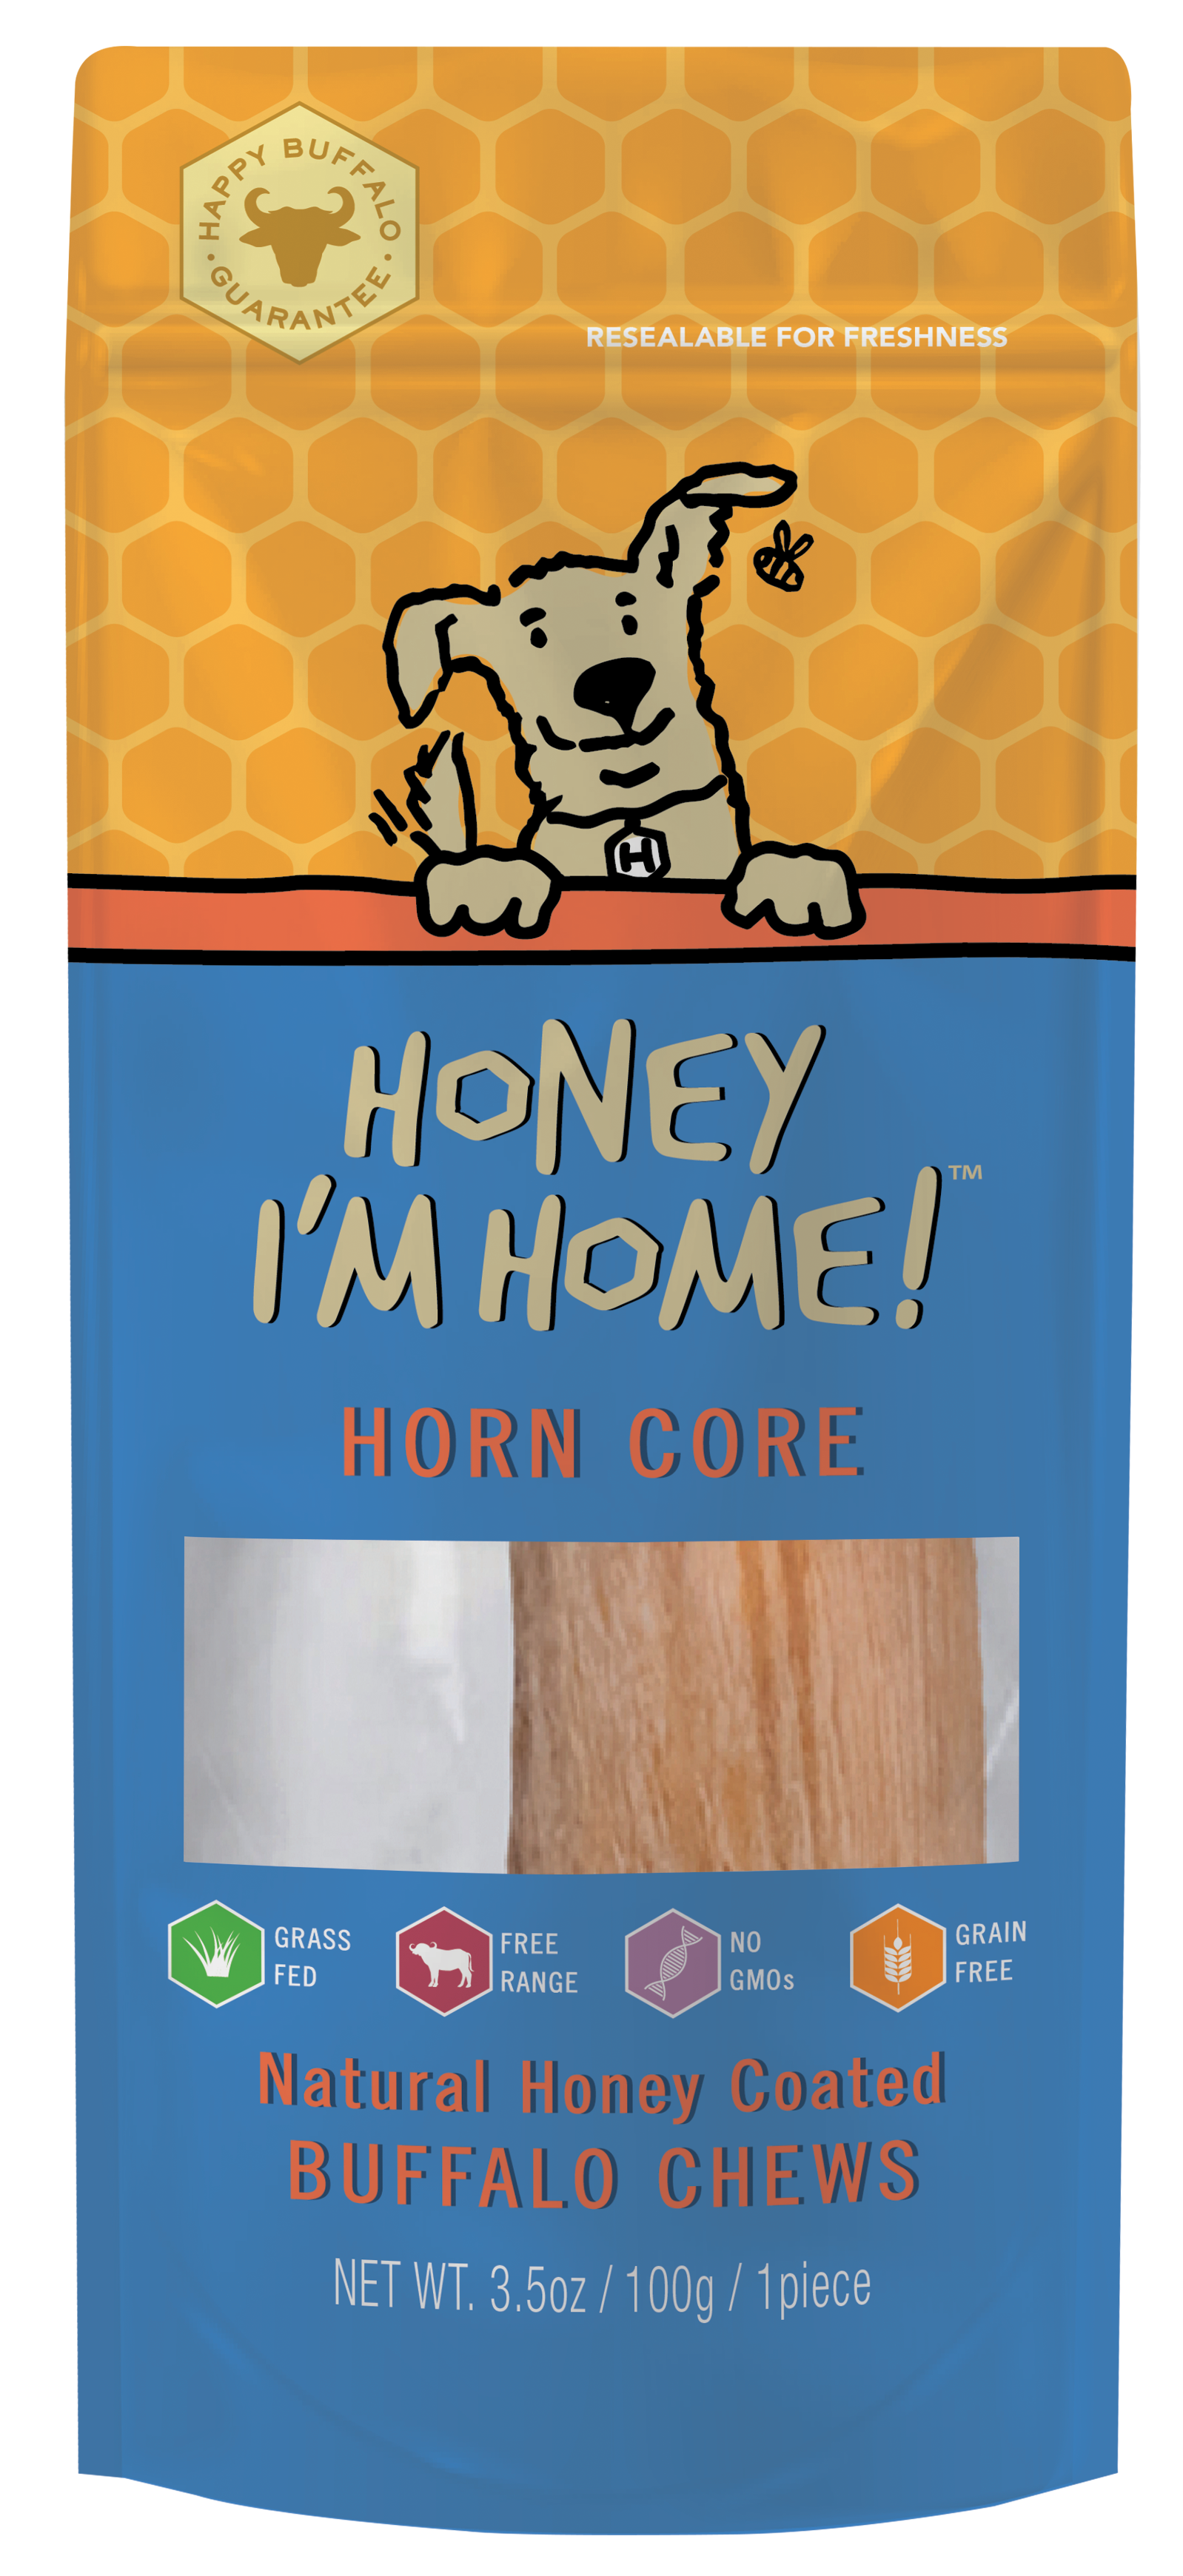 Honey I'm Home Natural Honey Coated Buffalo Horn Core Dog Chews